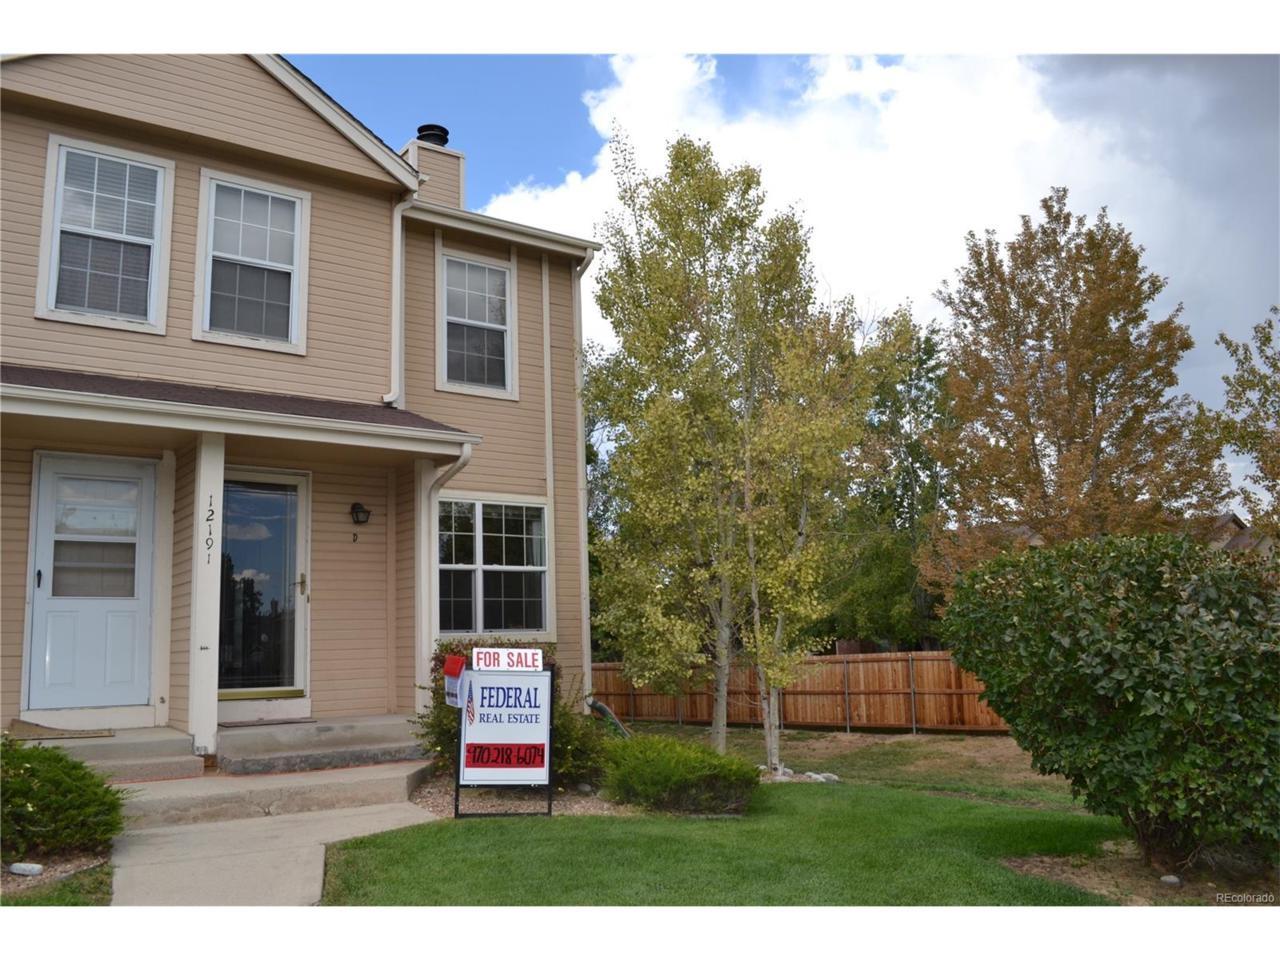 12191 Bannock Street D, Westminster, CO 80234 (MLS #9376186) :: 8z Real Estate